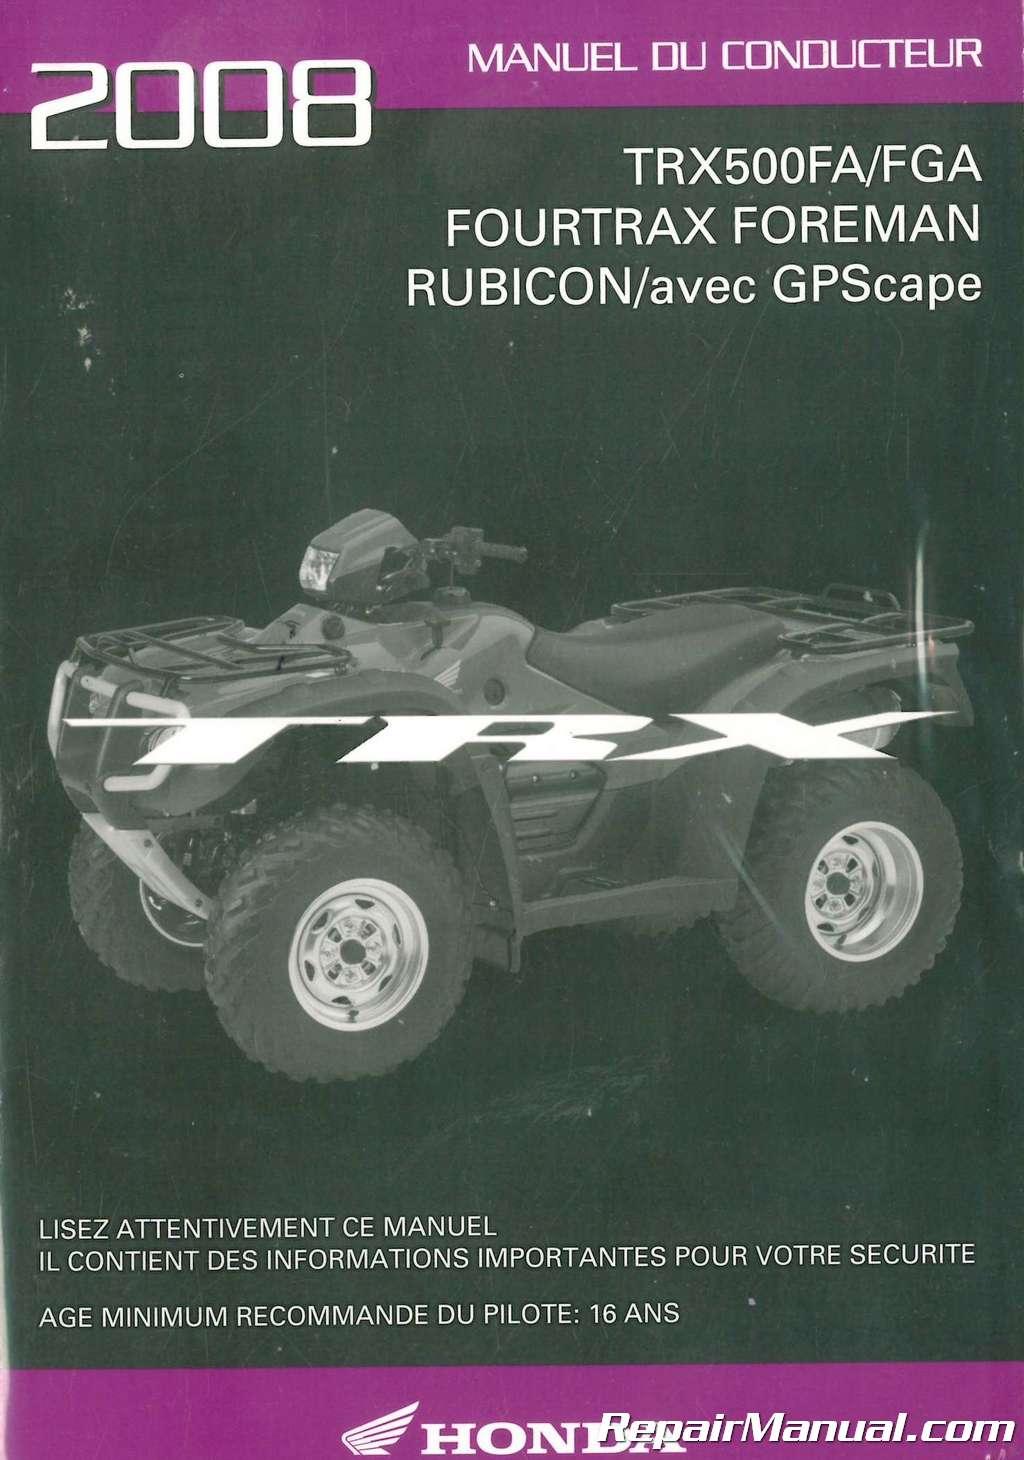 2011 honda rubicon owners manual